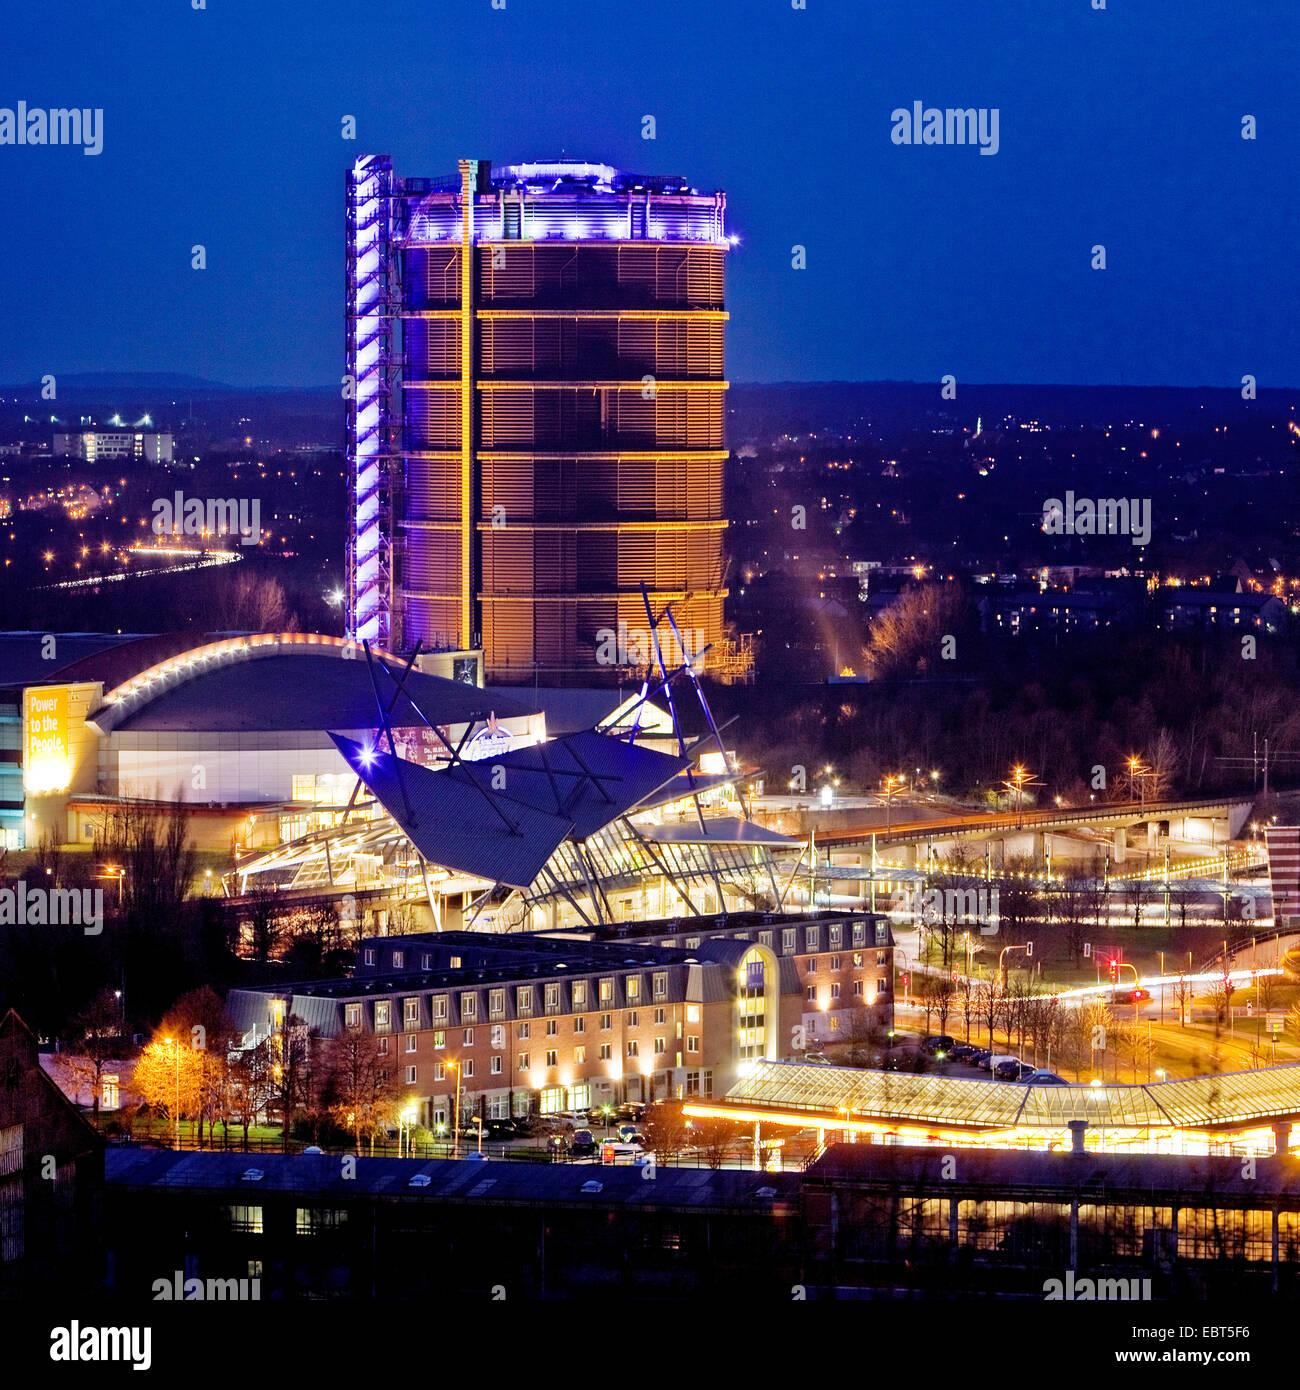 Neue Mitte Oberhausen, CentrO and Gasometer in evening light, Germany, North Rhine-Westphalia, Ruhr Area, Oberhausen Stock Photo